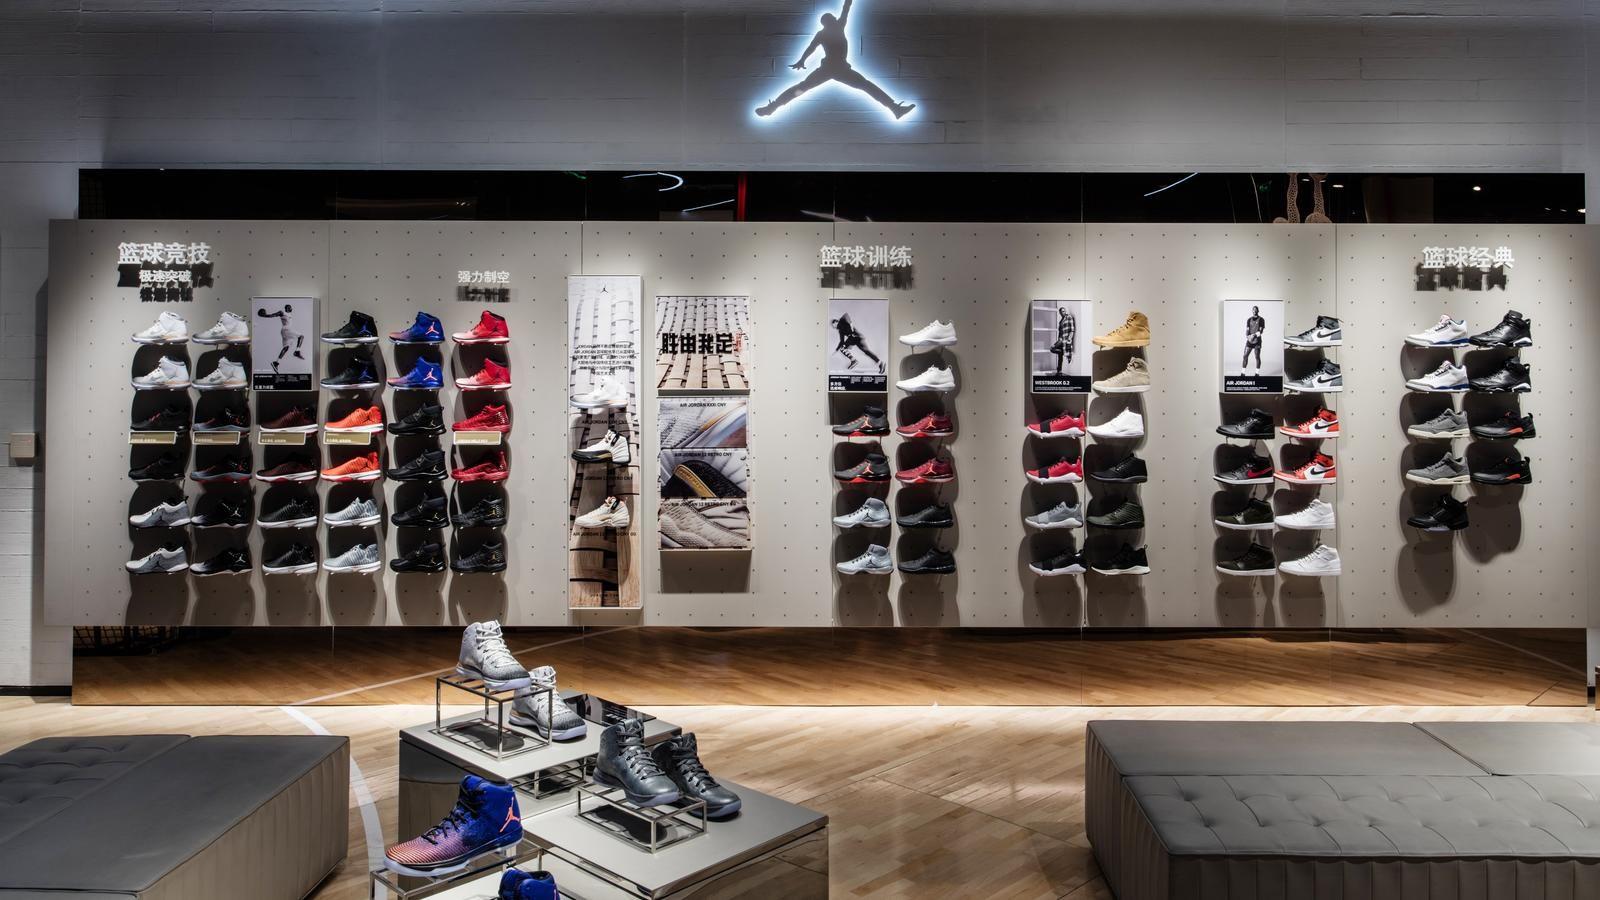 d3ca84149bad BEIJING Nike News - First Look  Inside the Nike   Jordan Basketball  Experience Store in Beijing